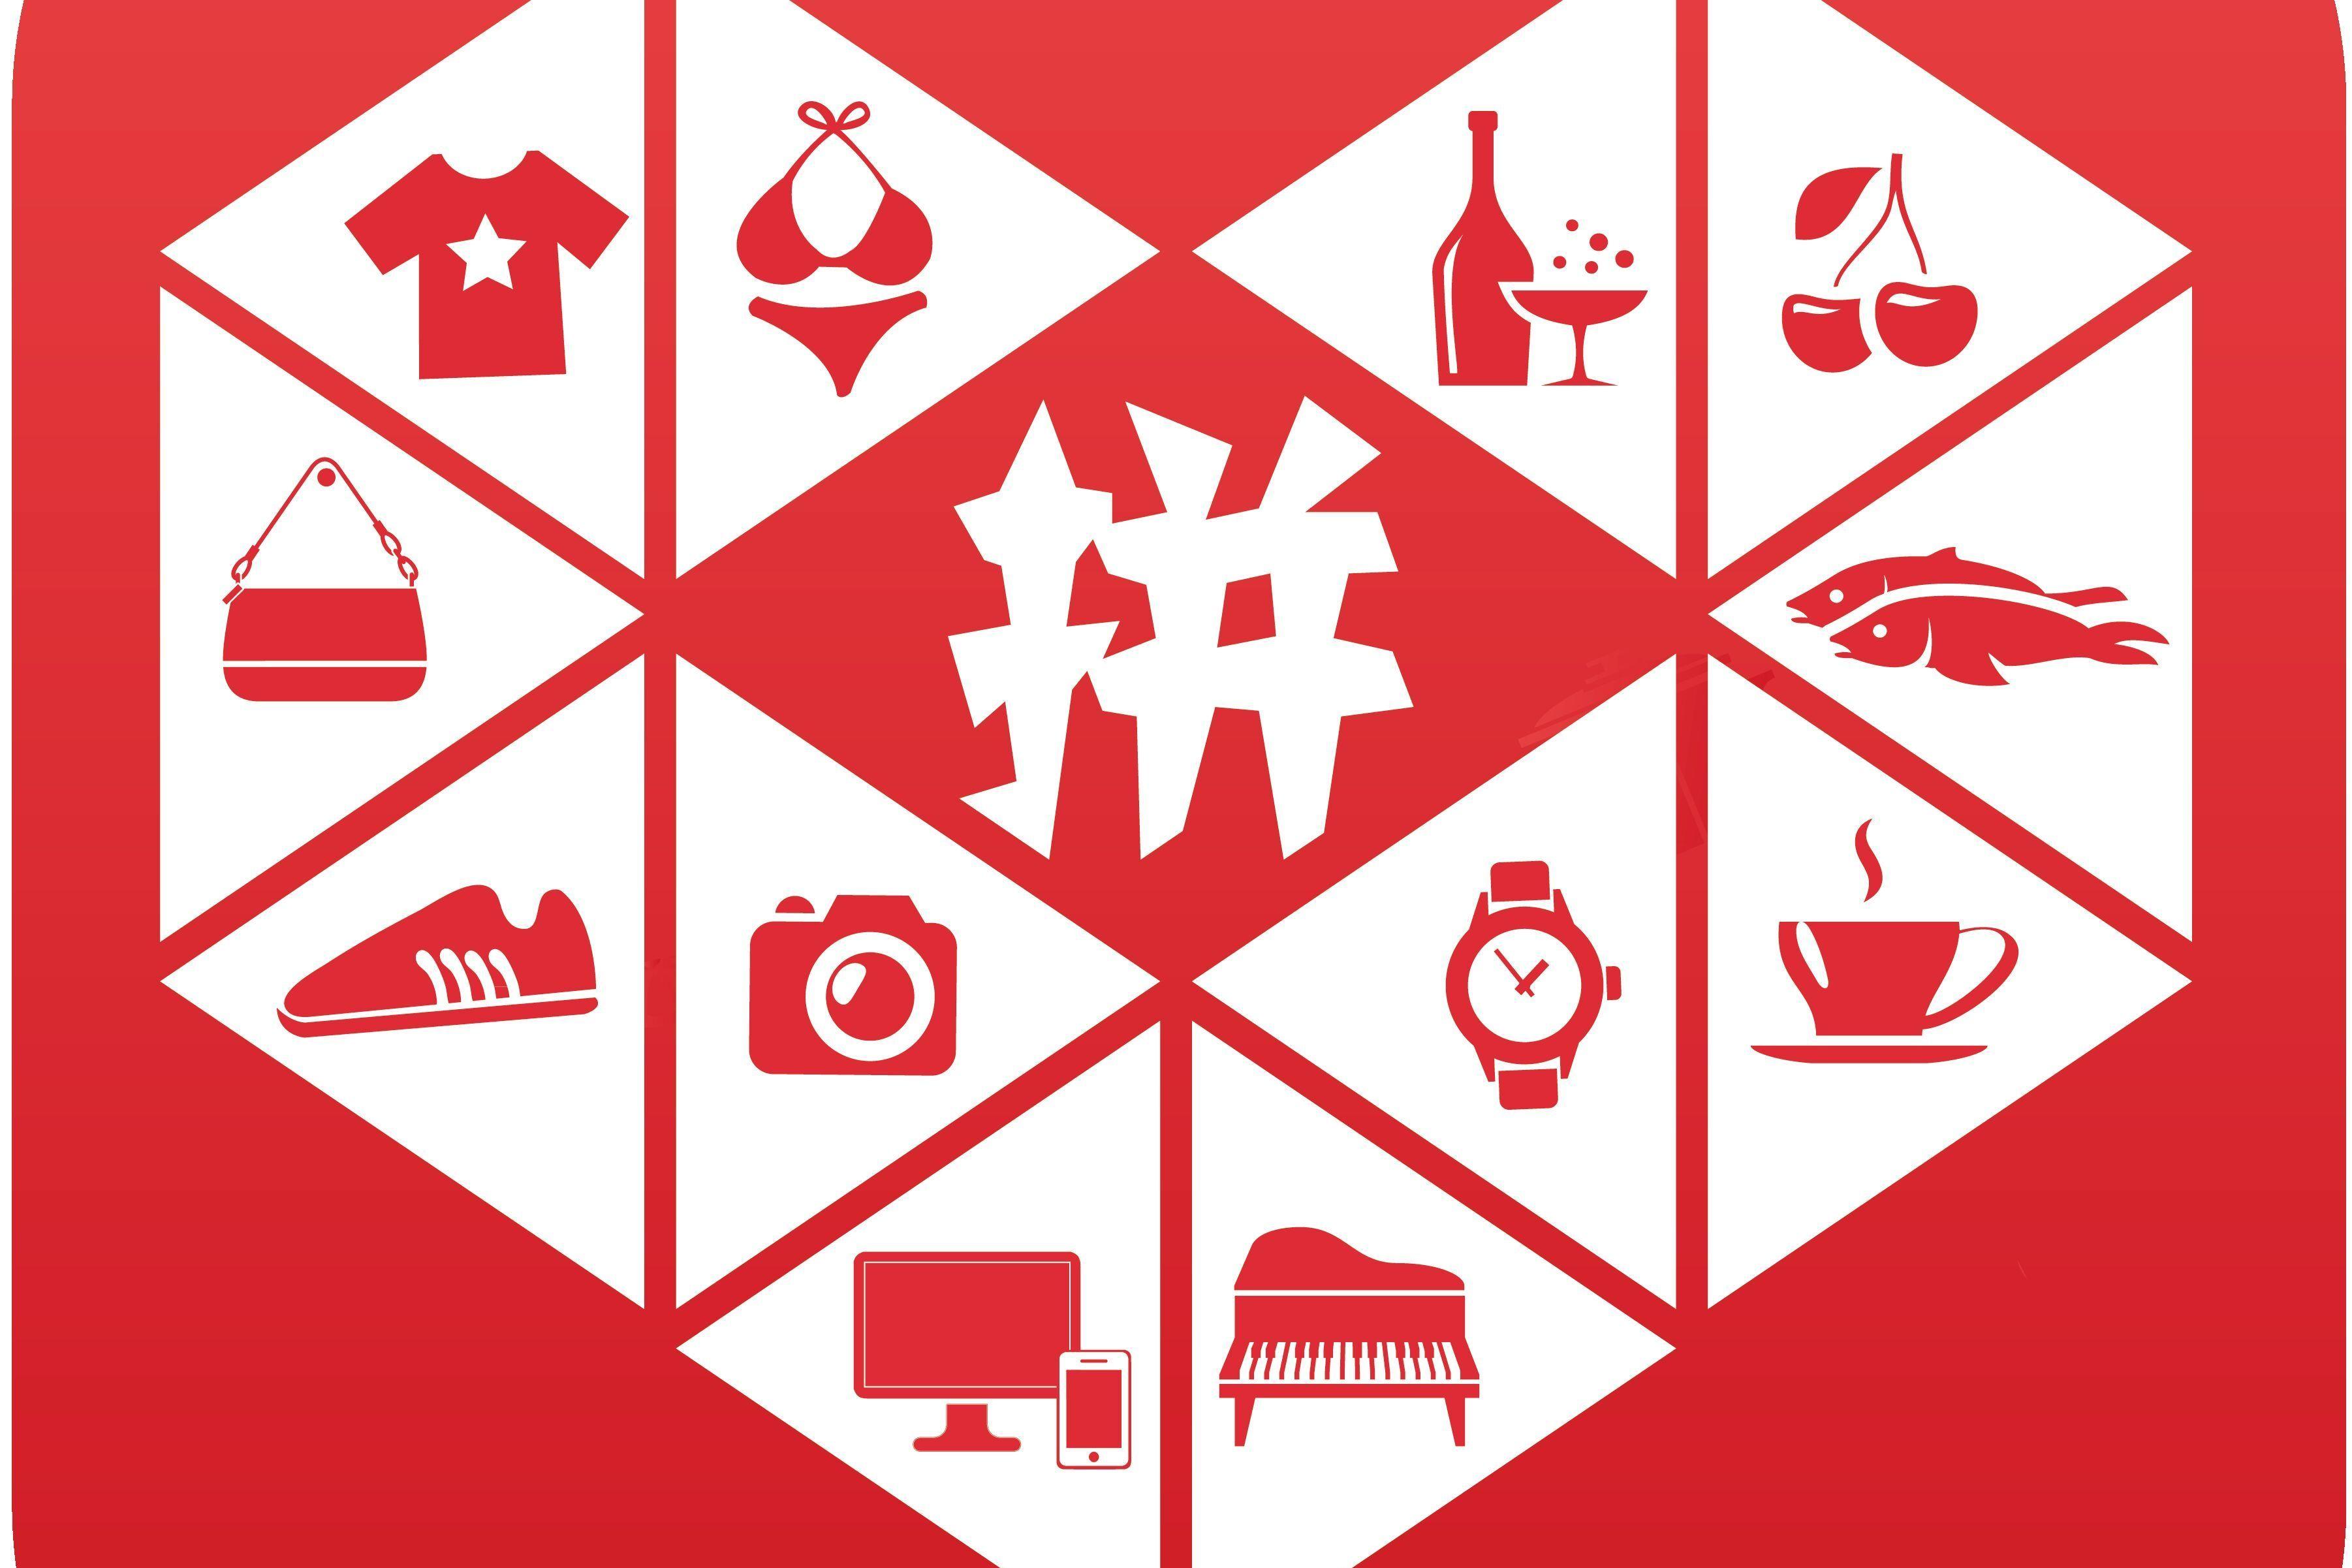 logo 标识 标志 剪纸 设计 图标 3603_2402